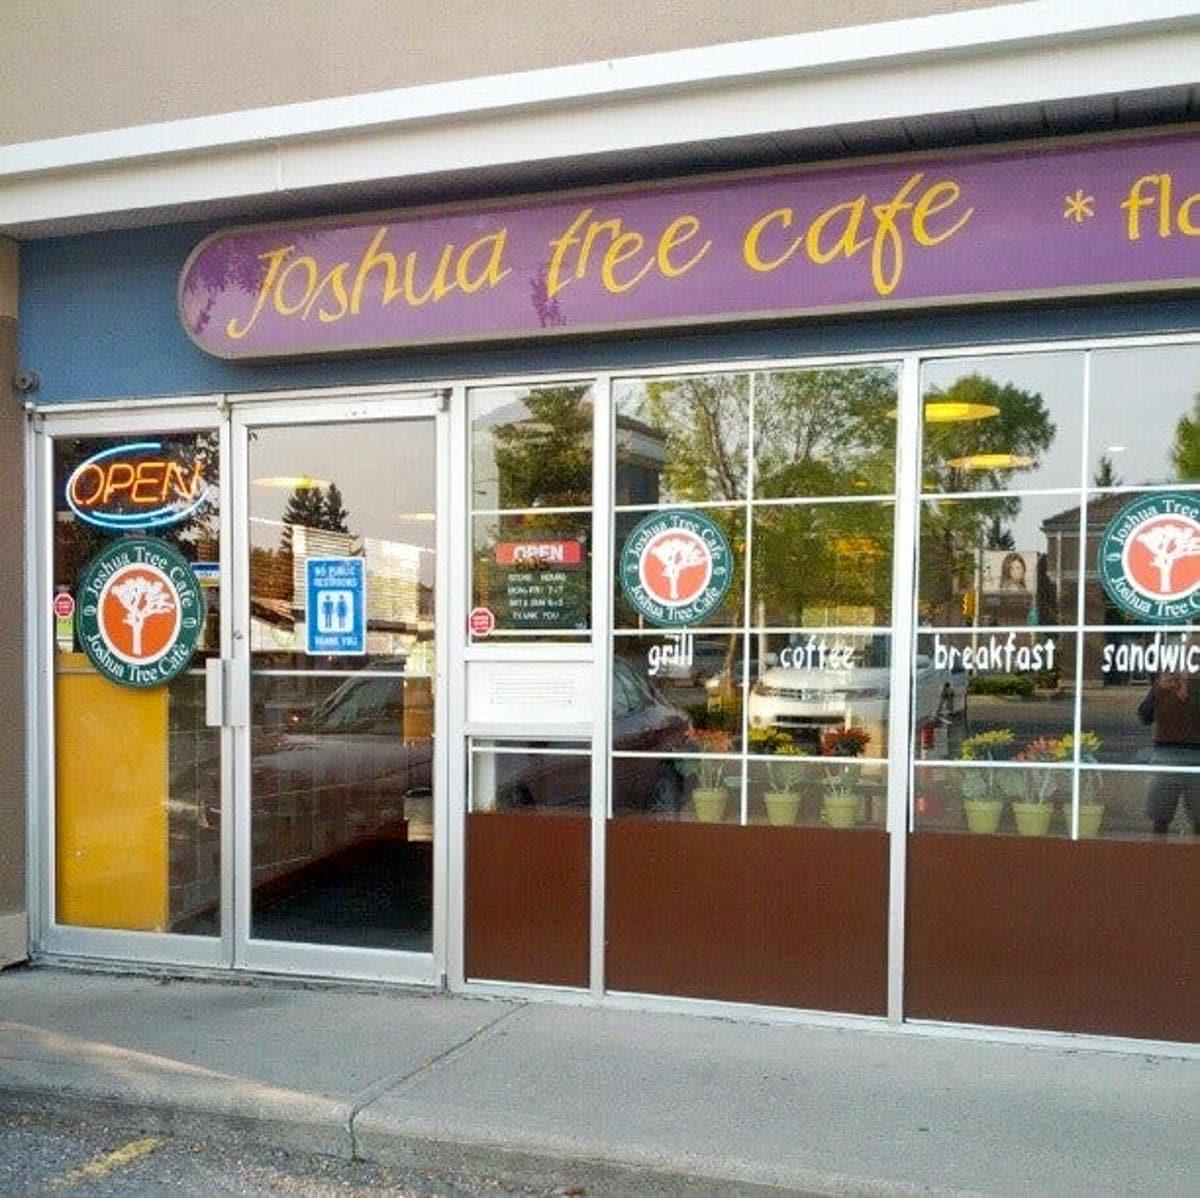 storefront of Joshua tree cafe Calgary